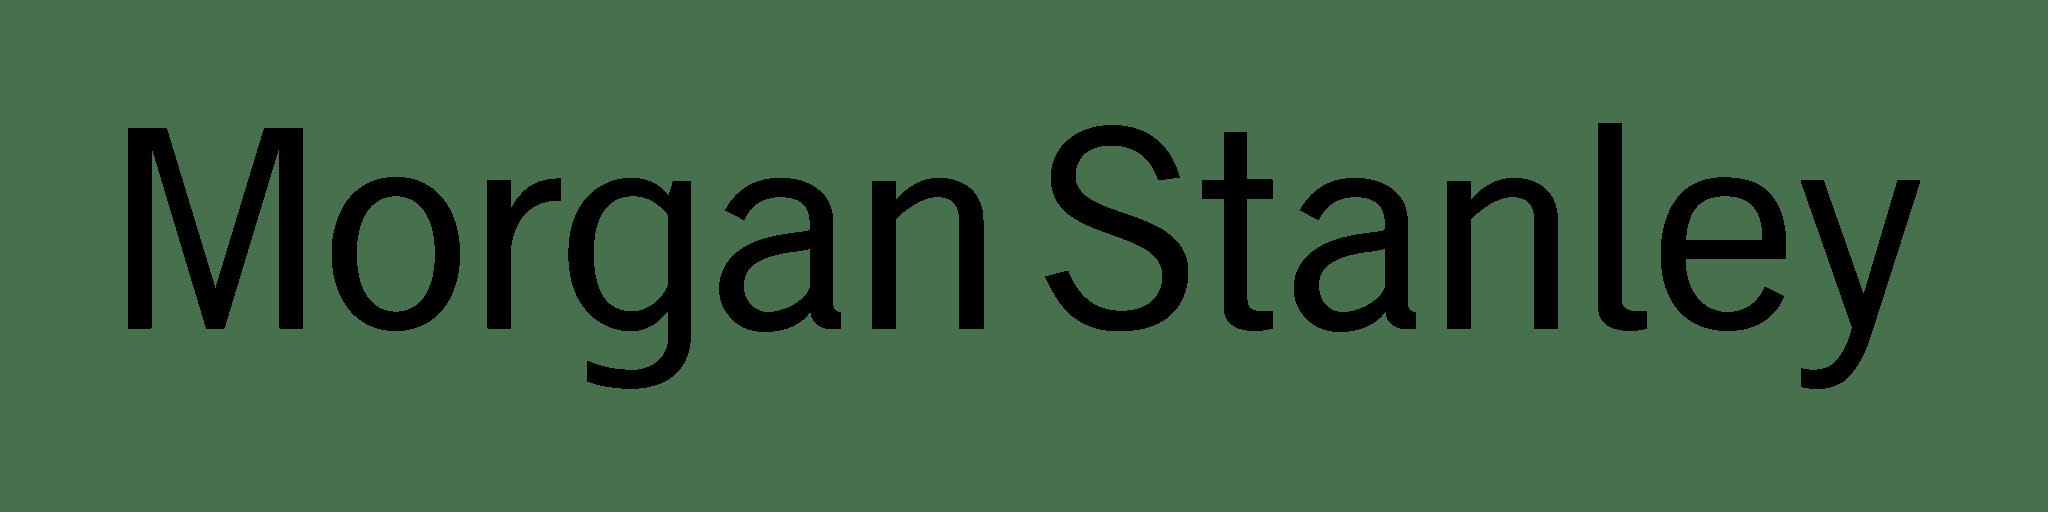 Morgan Stanley Logo Transparent Png Stickpng